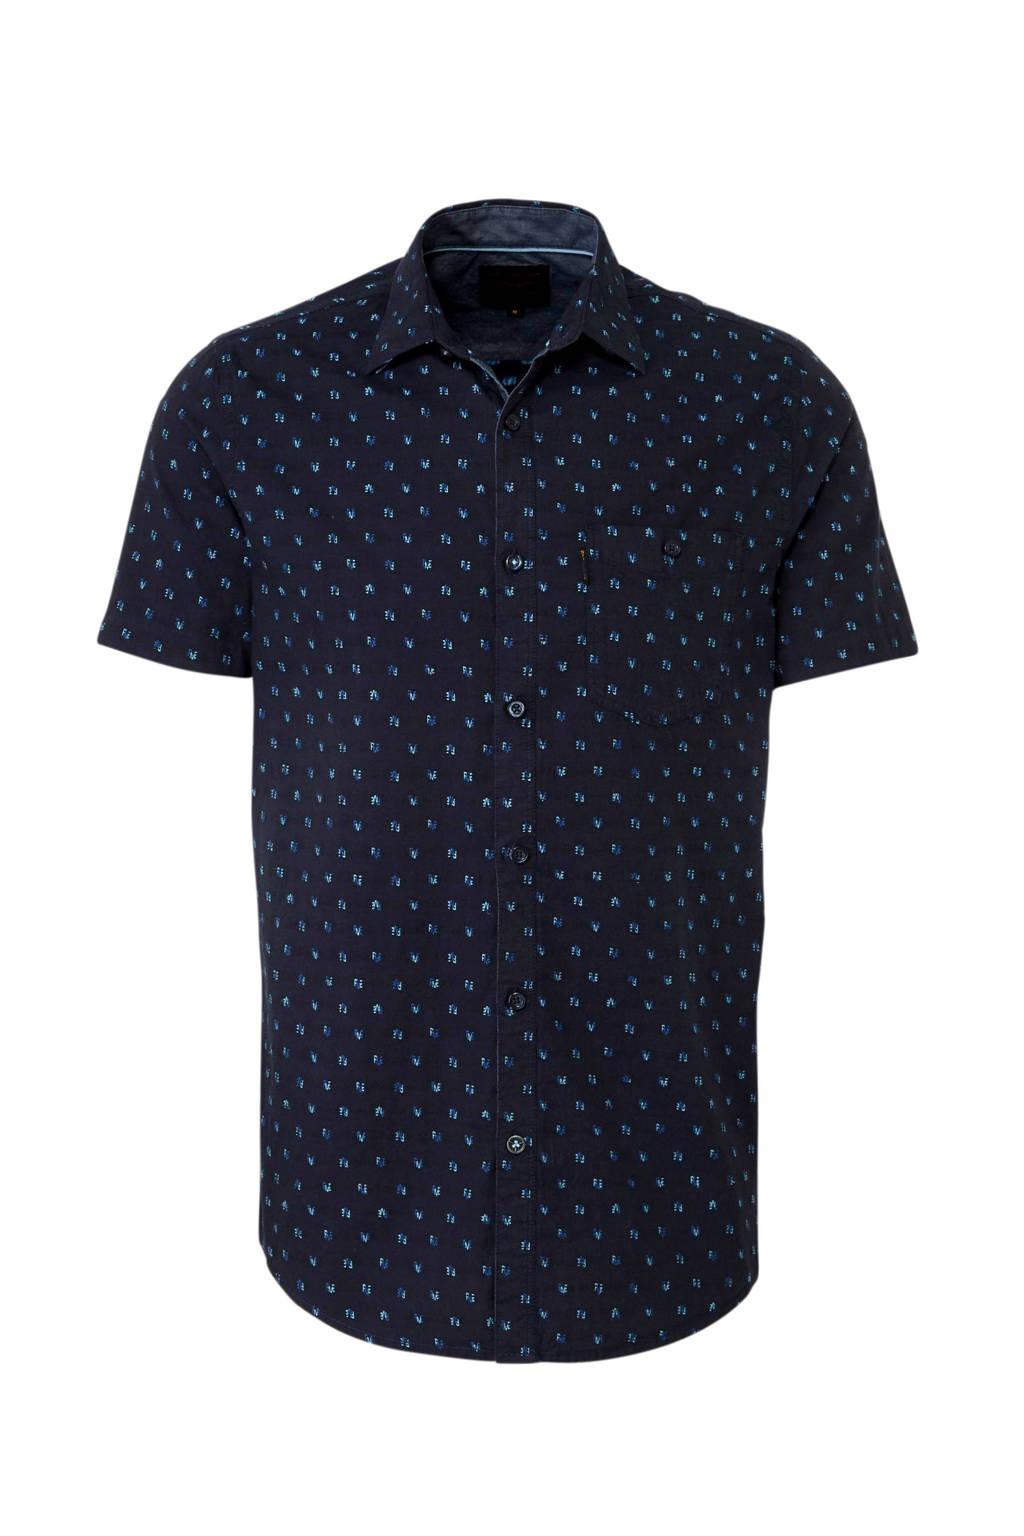 PME Legend overhemd Fil Coupé Paul, Blauw